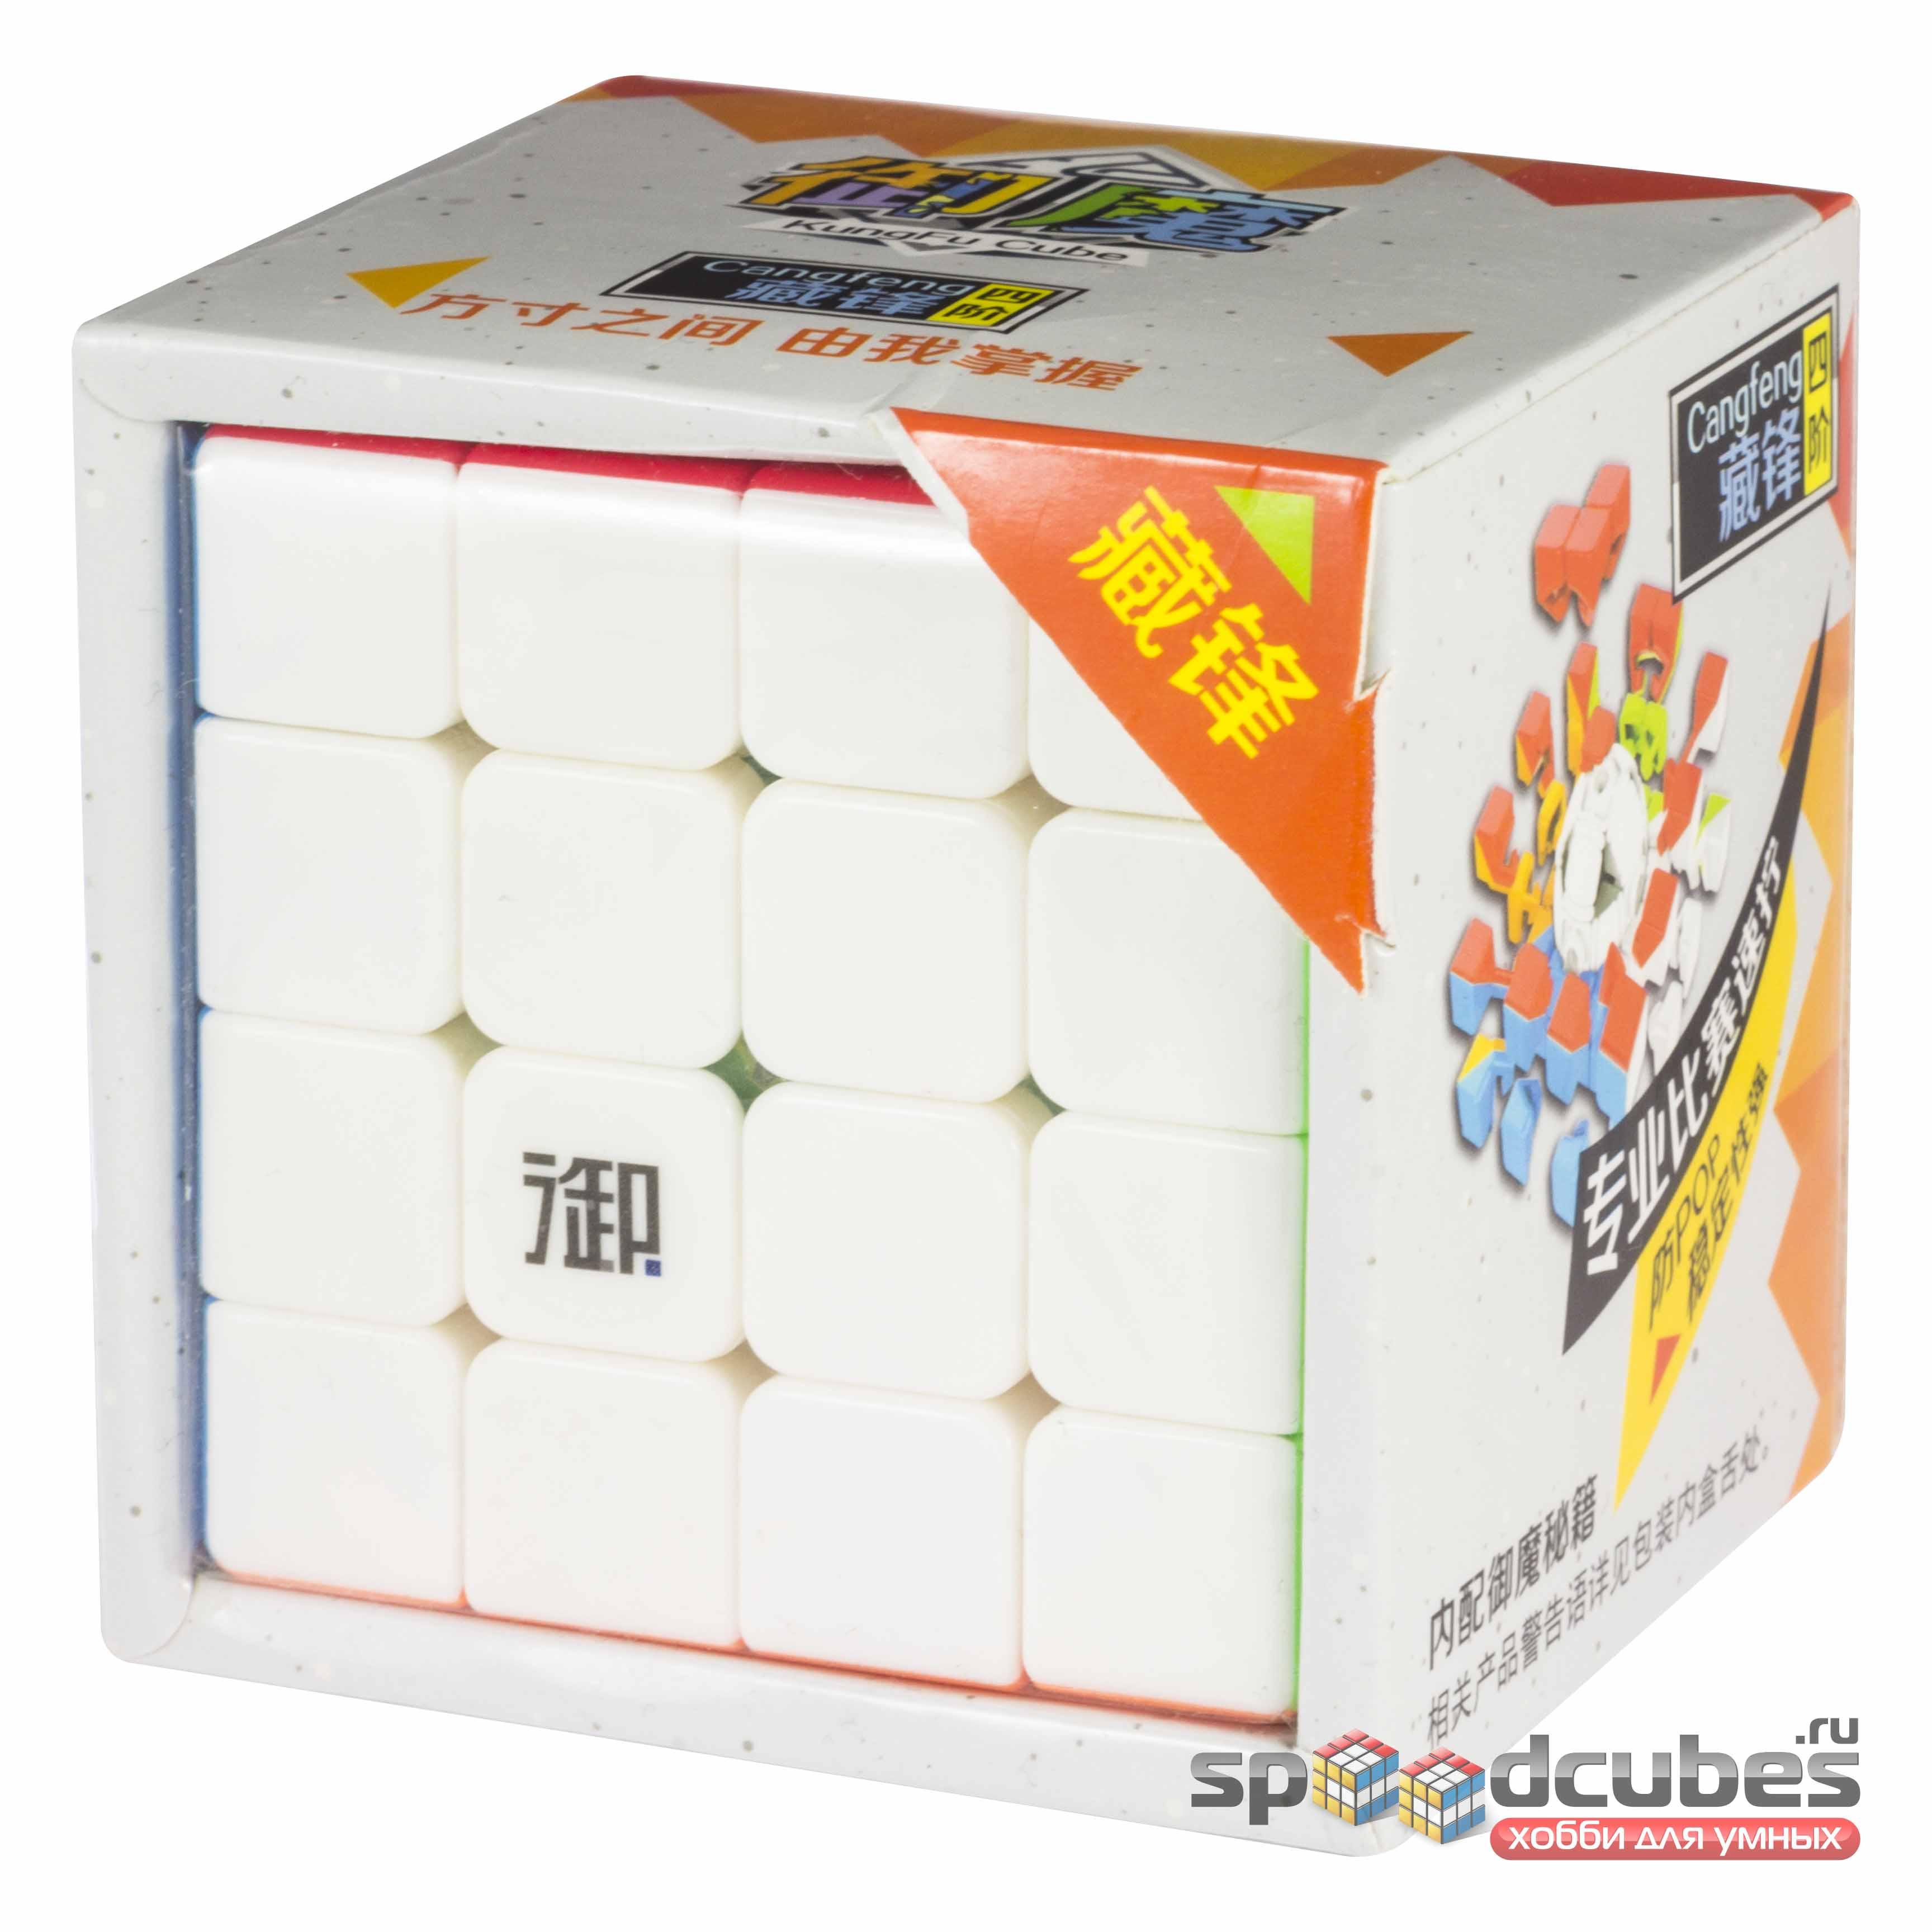 KungFu 4x4x4 CangFeng (цв) 1